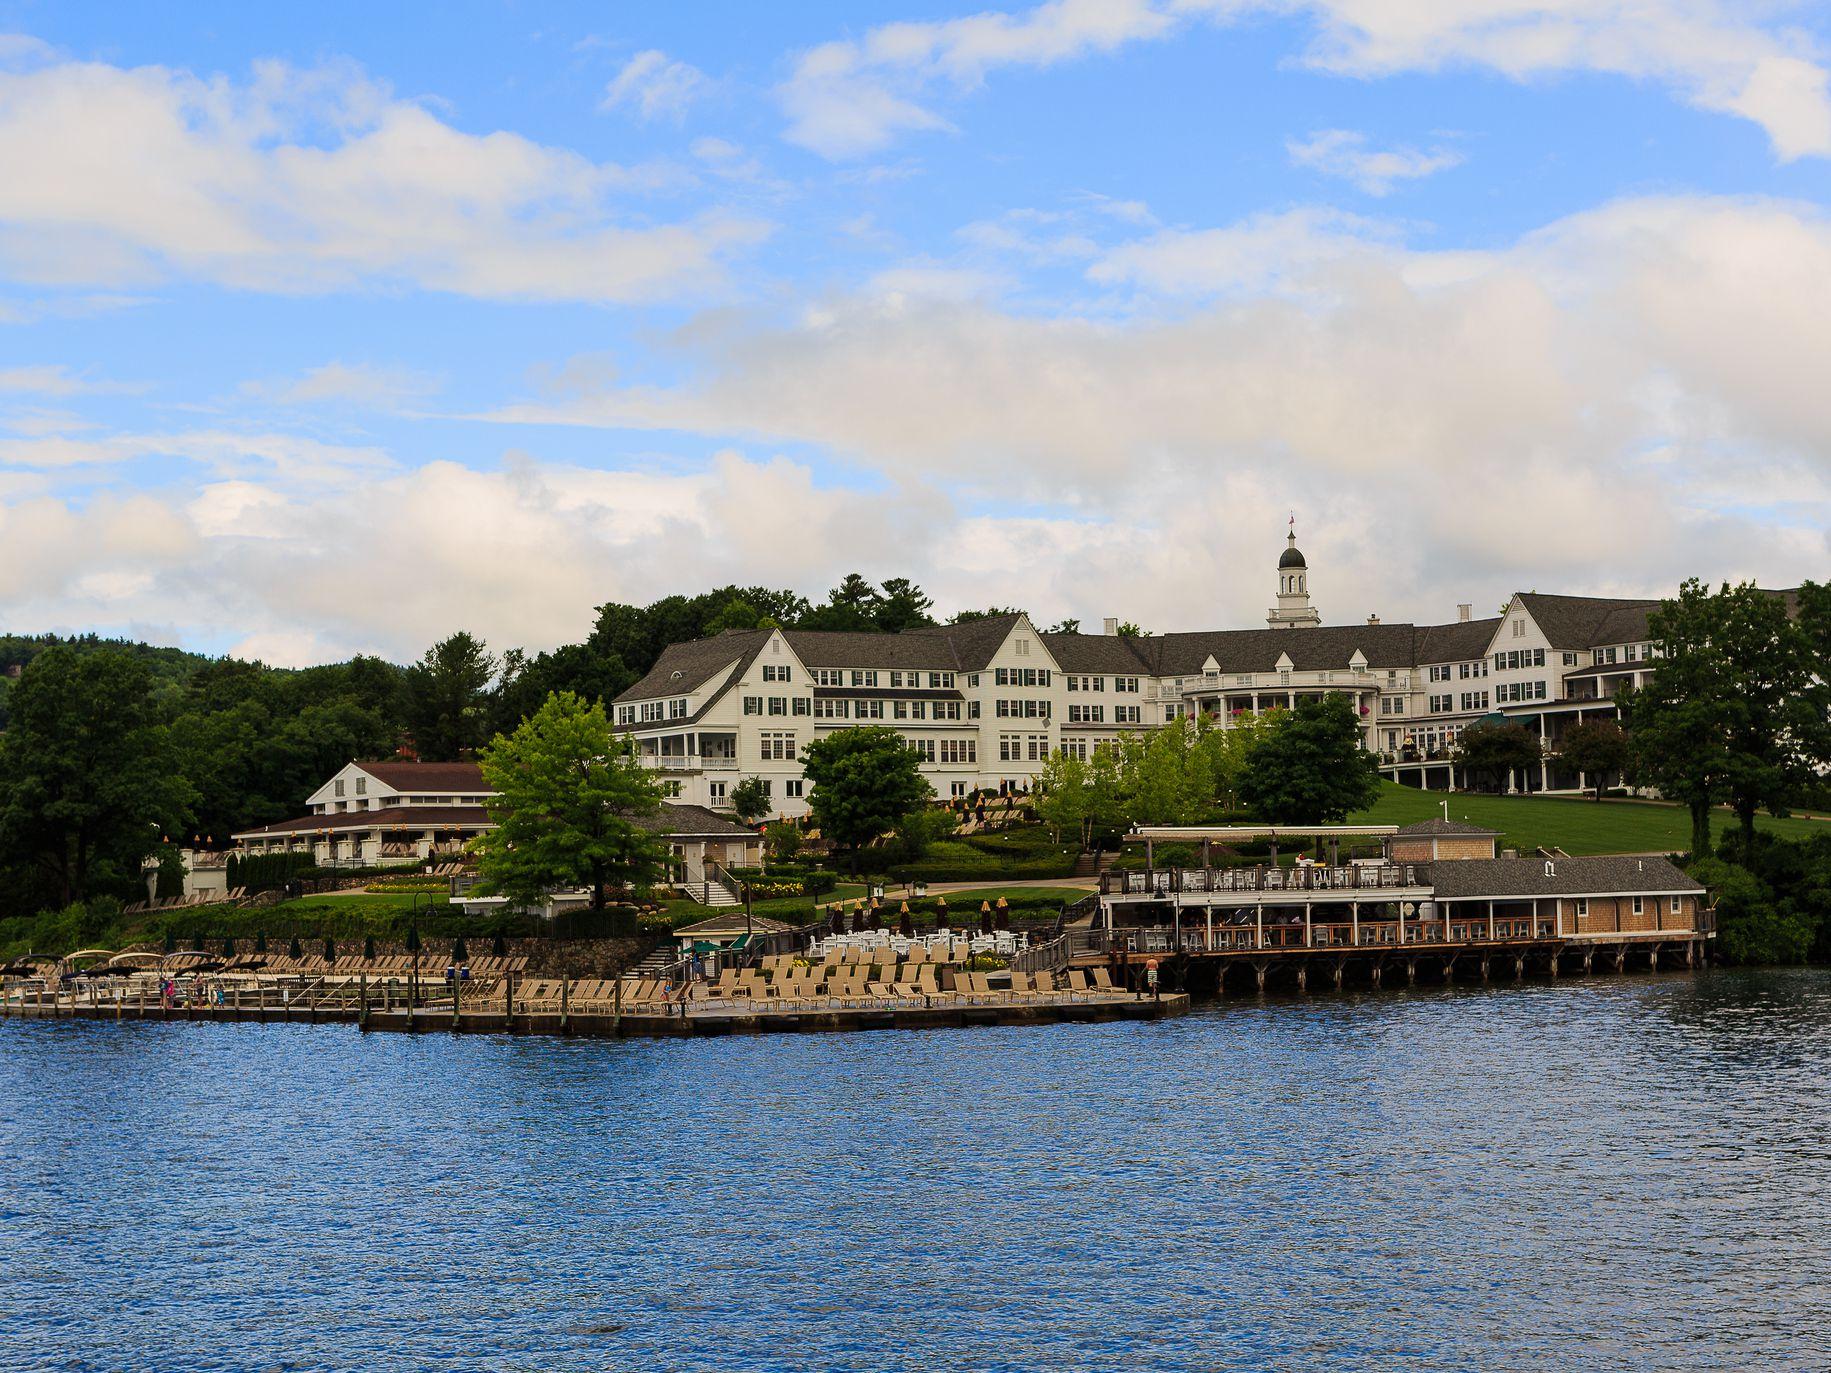 The Historic Hotel Sagamore on Lake George, New York